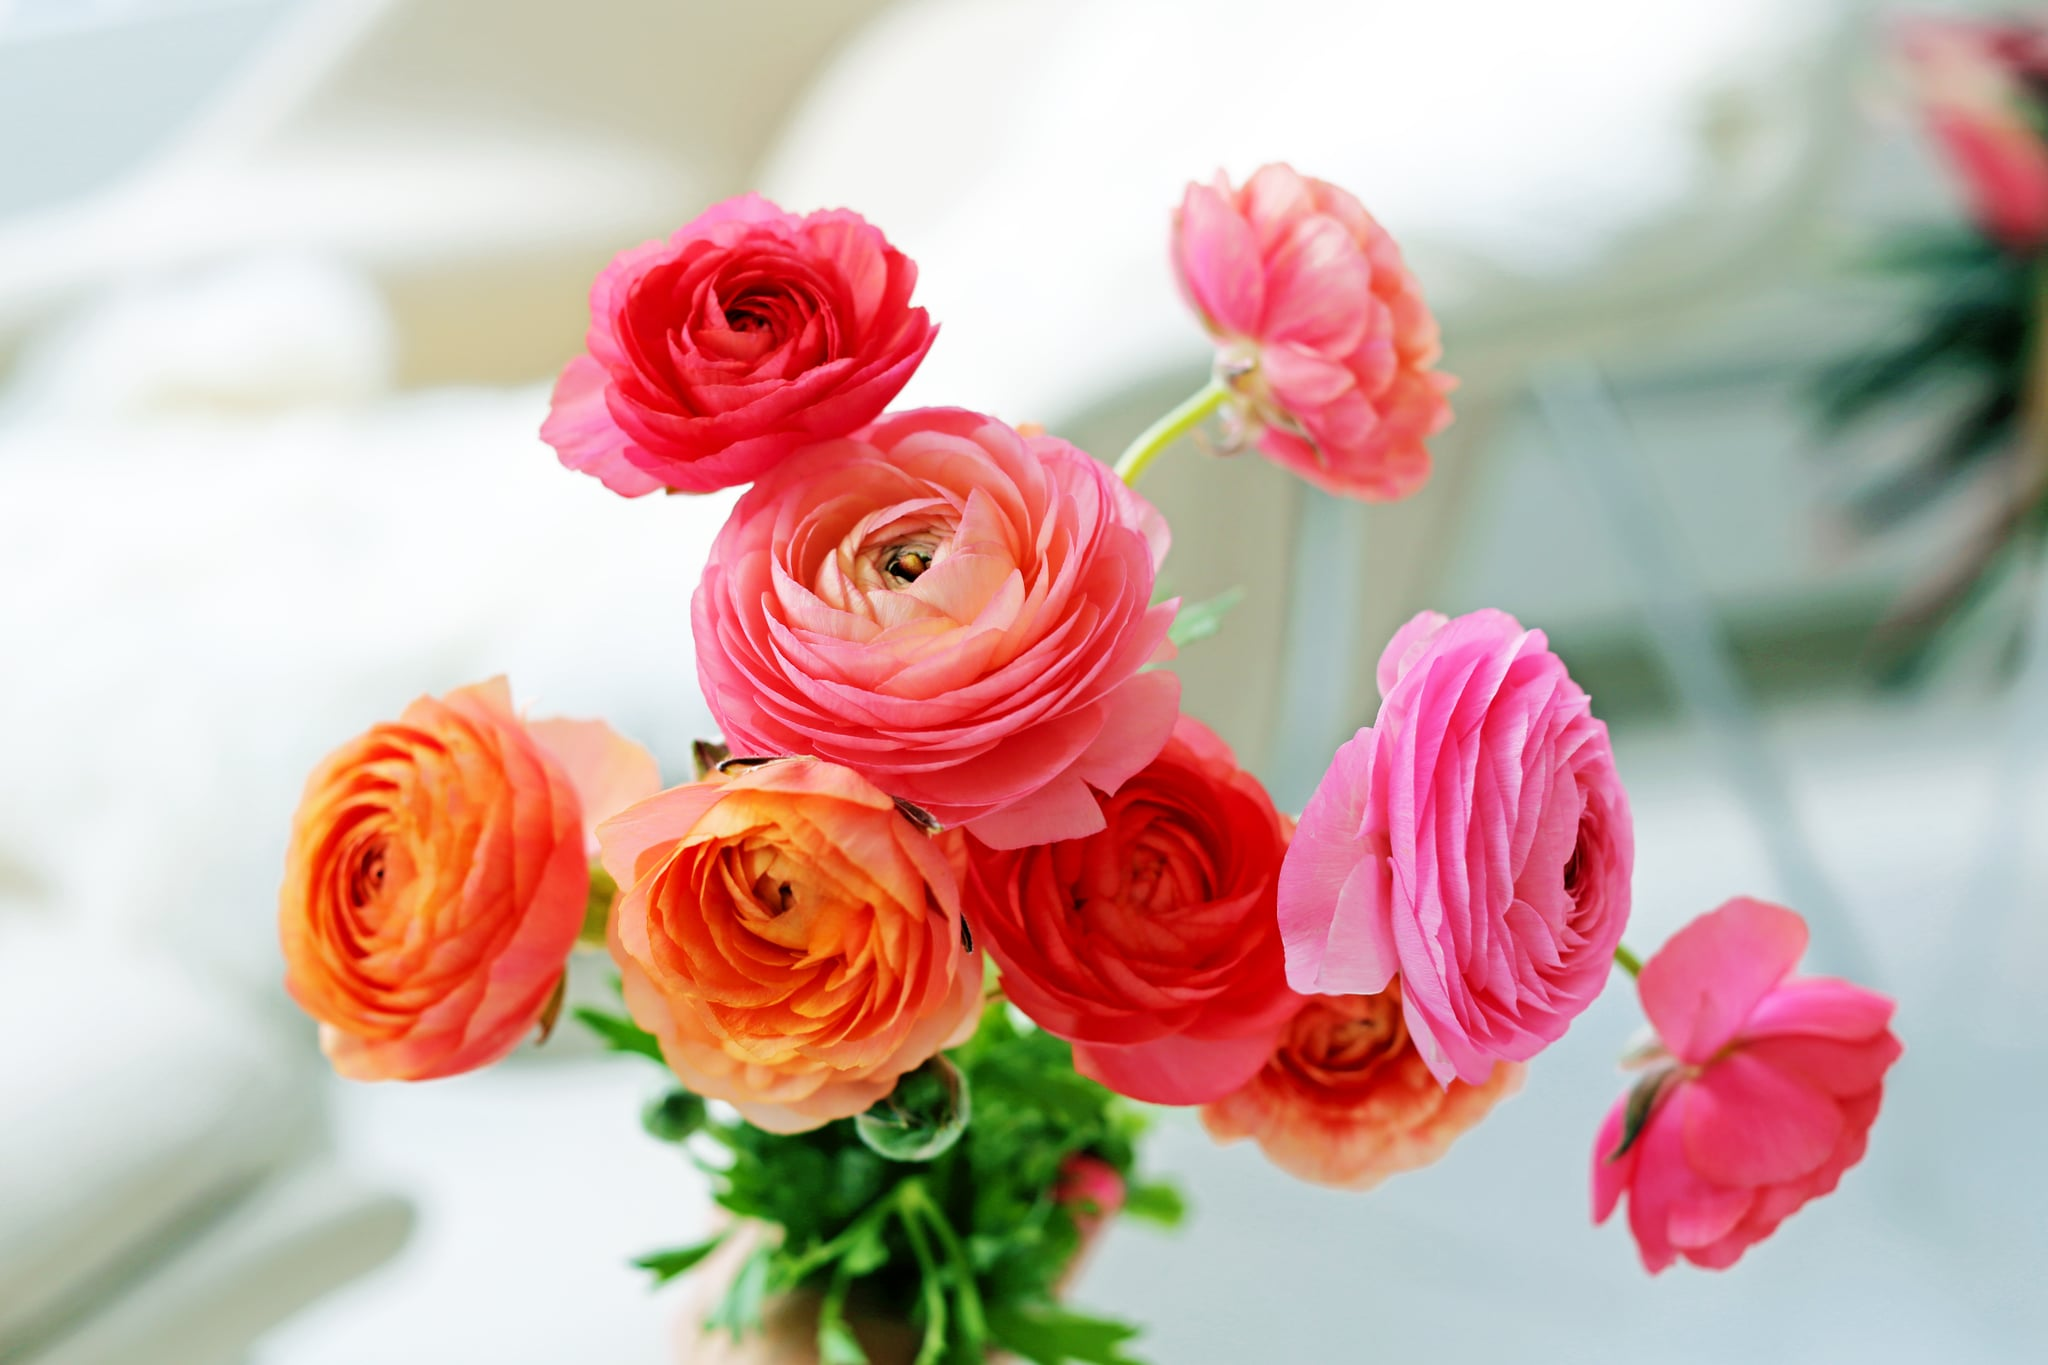 How To Take Care Of Fresh Flowers Popsugar Smart Living